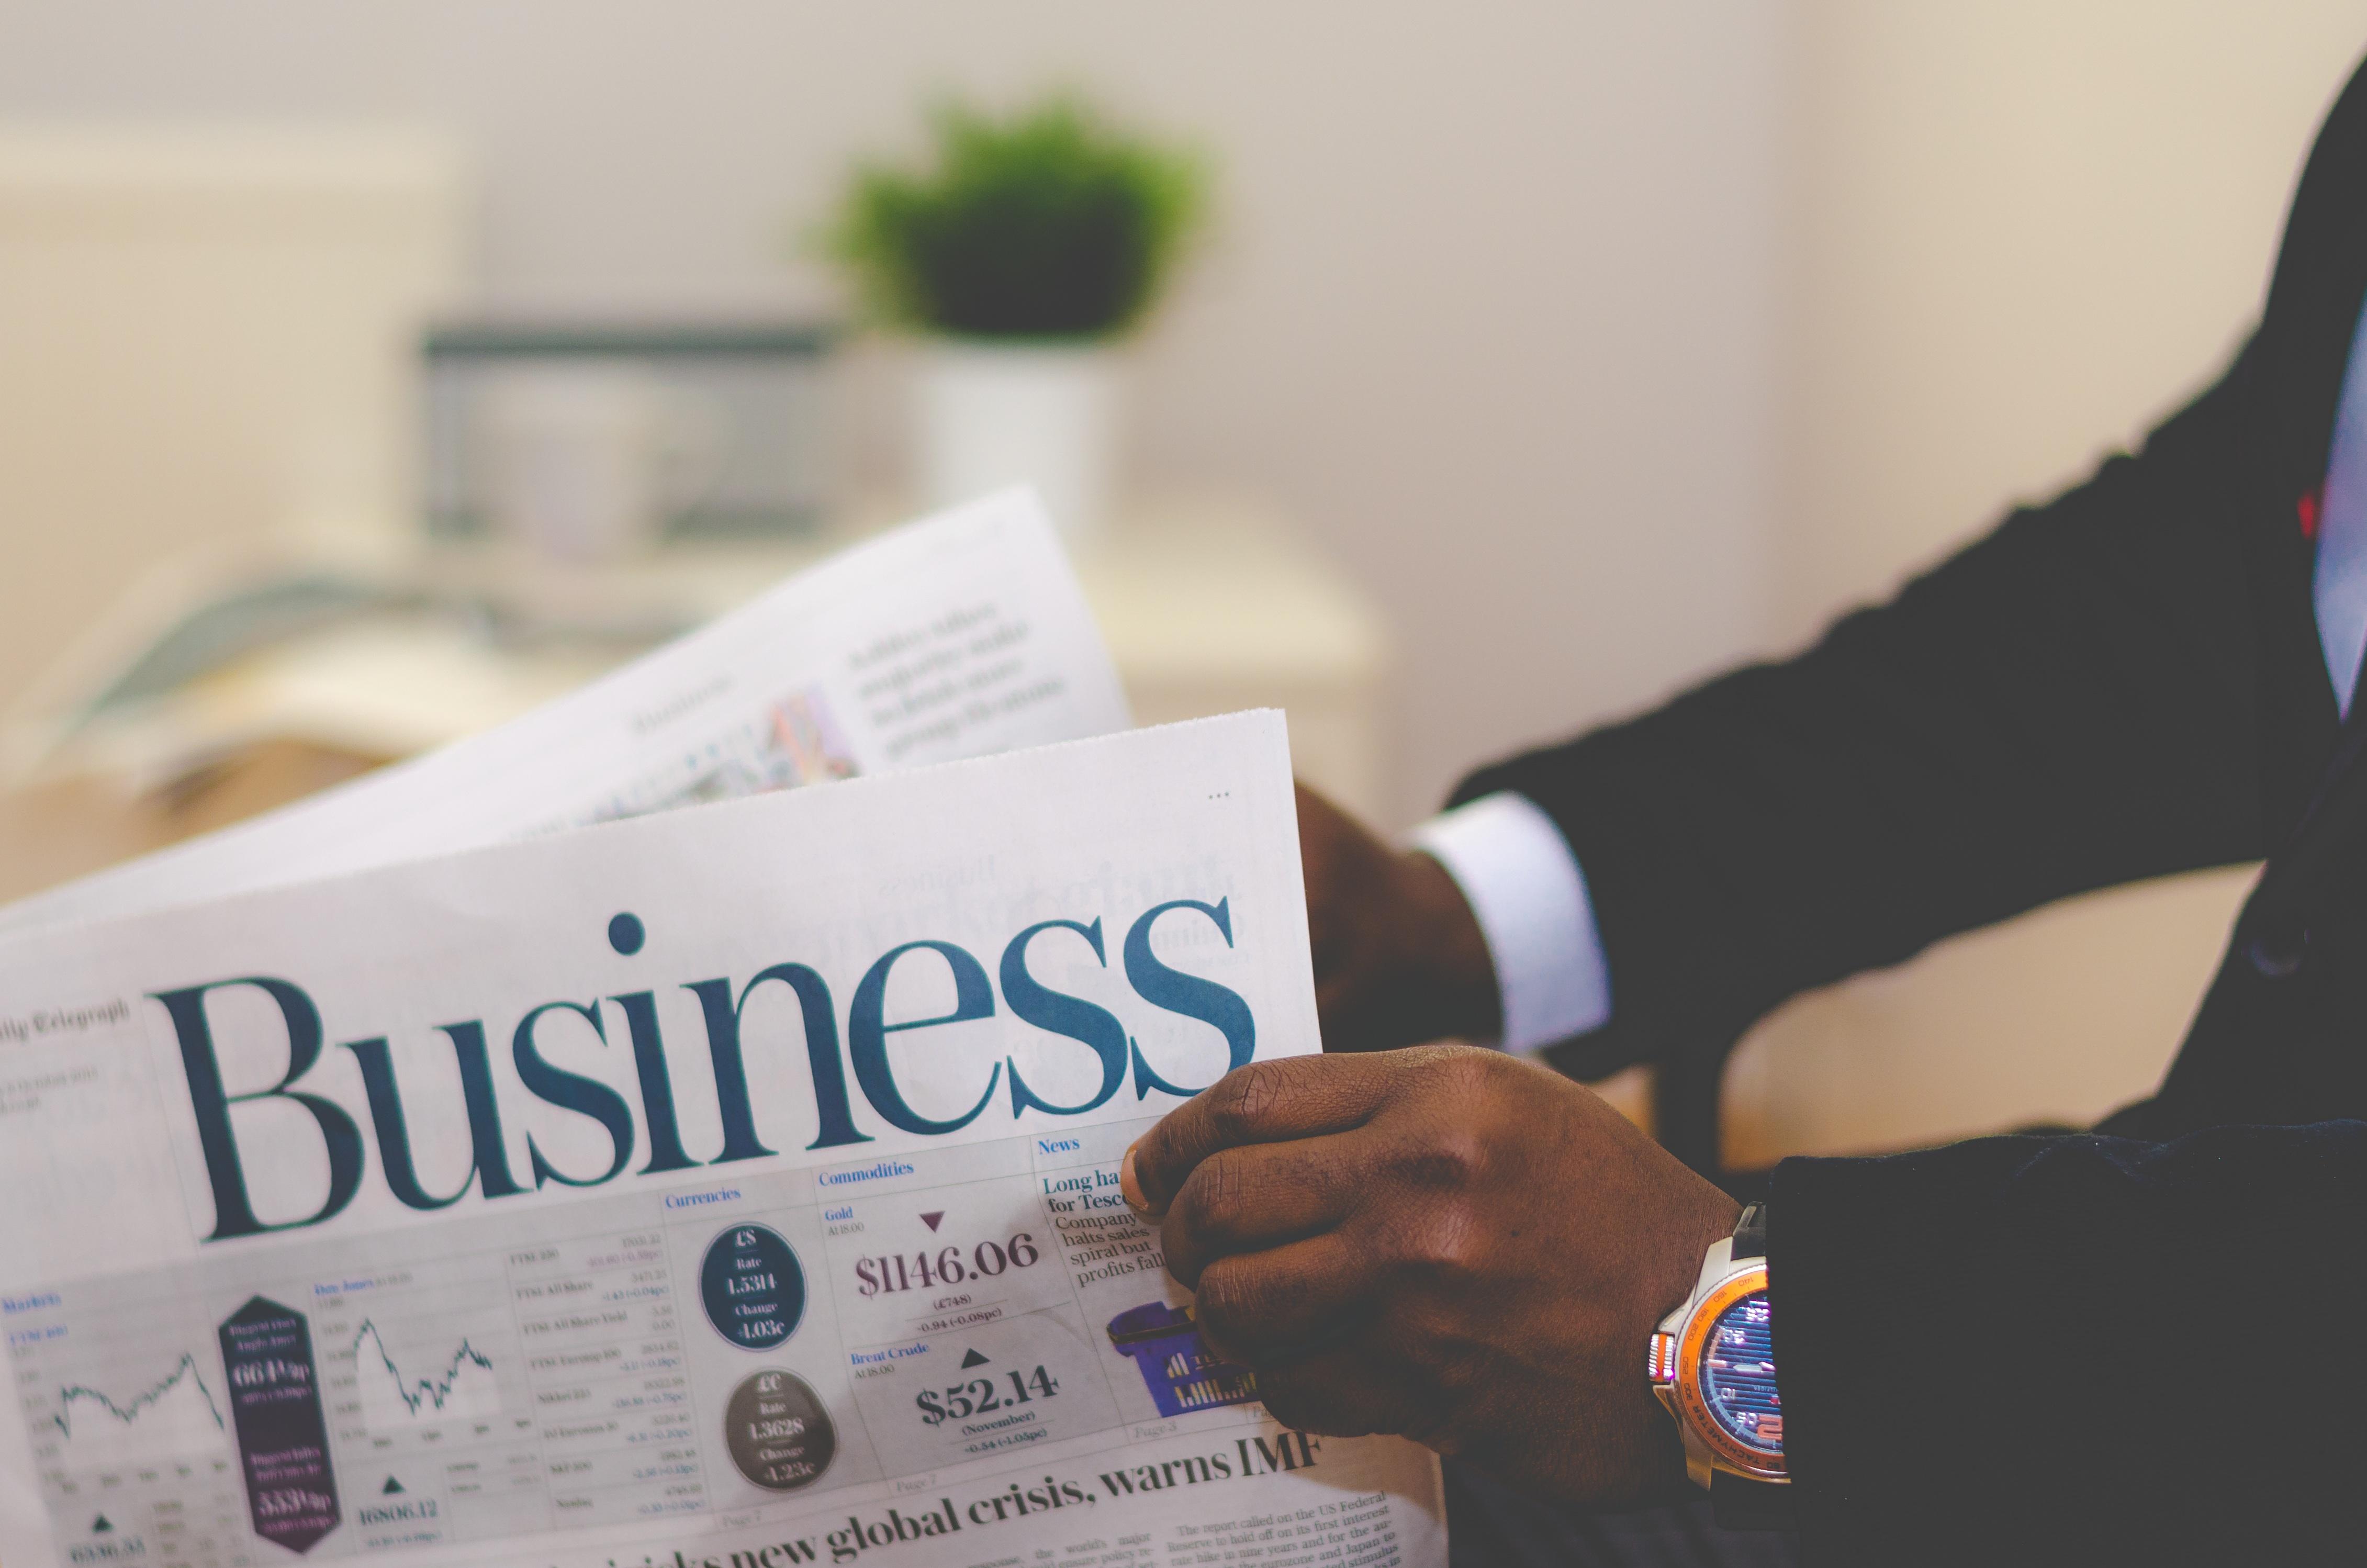 business ziar startup